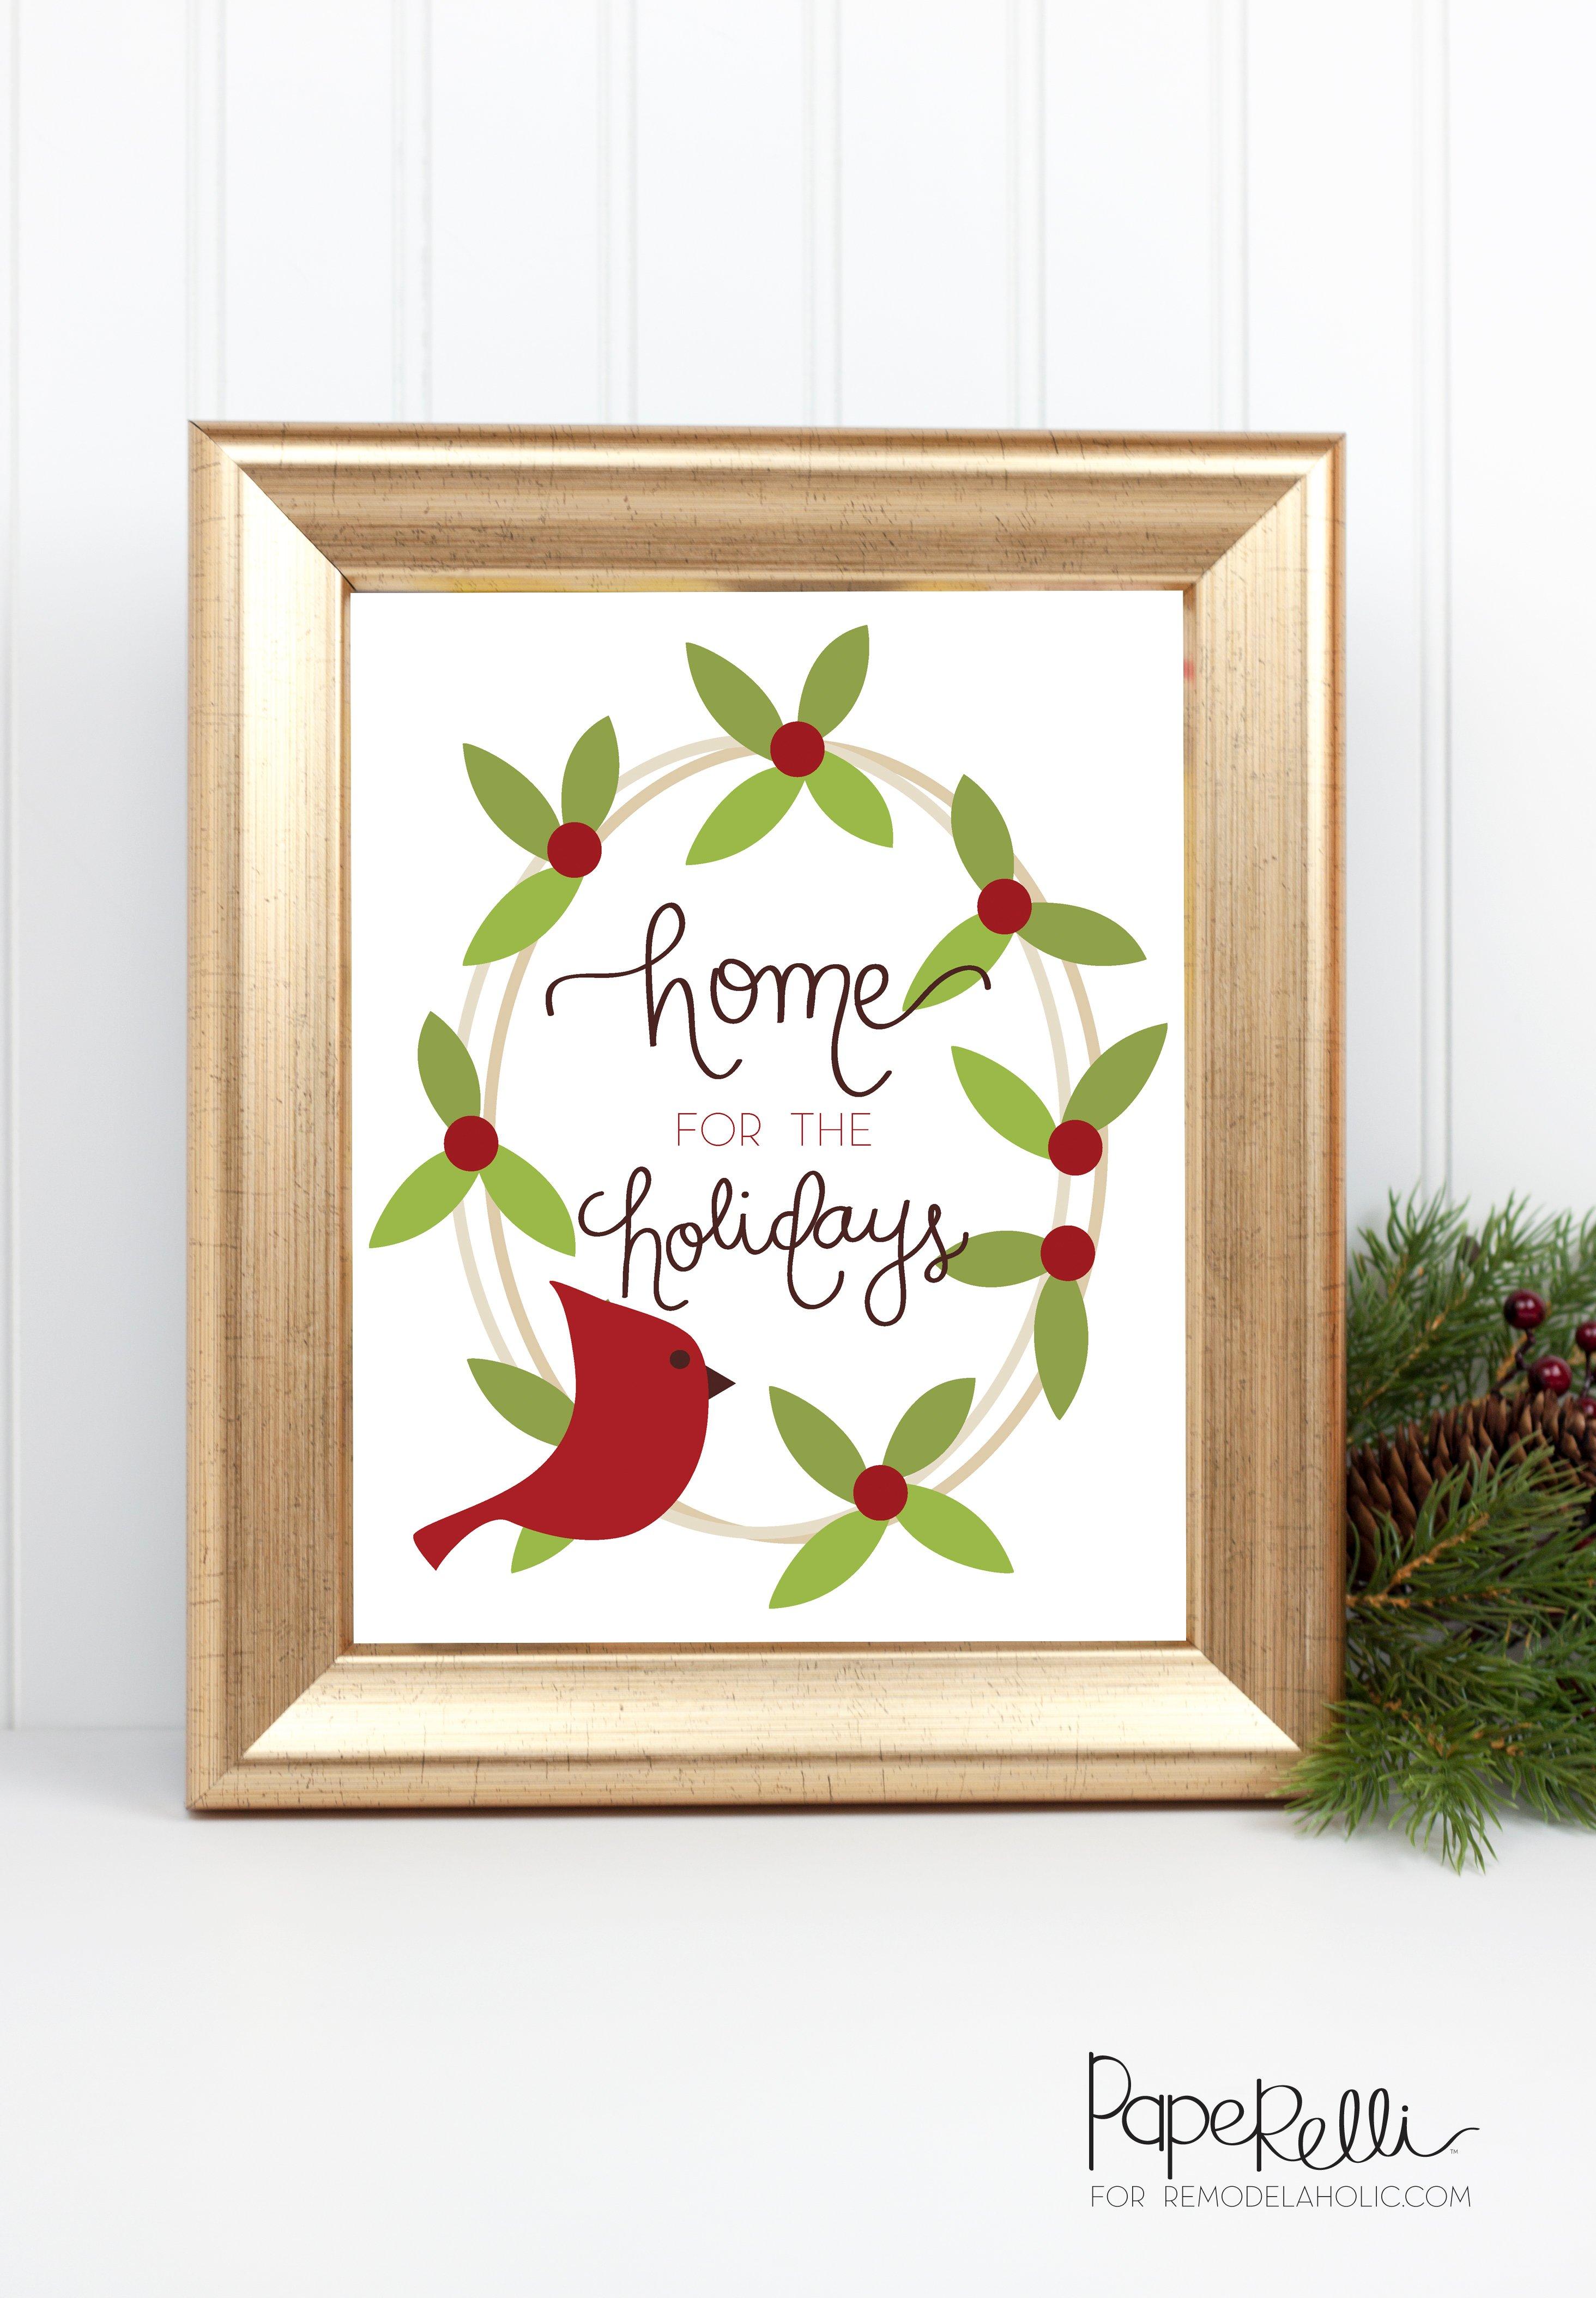 Remodelaholic Last Minute Free Printable Gift Ideas